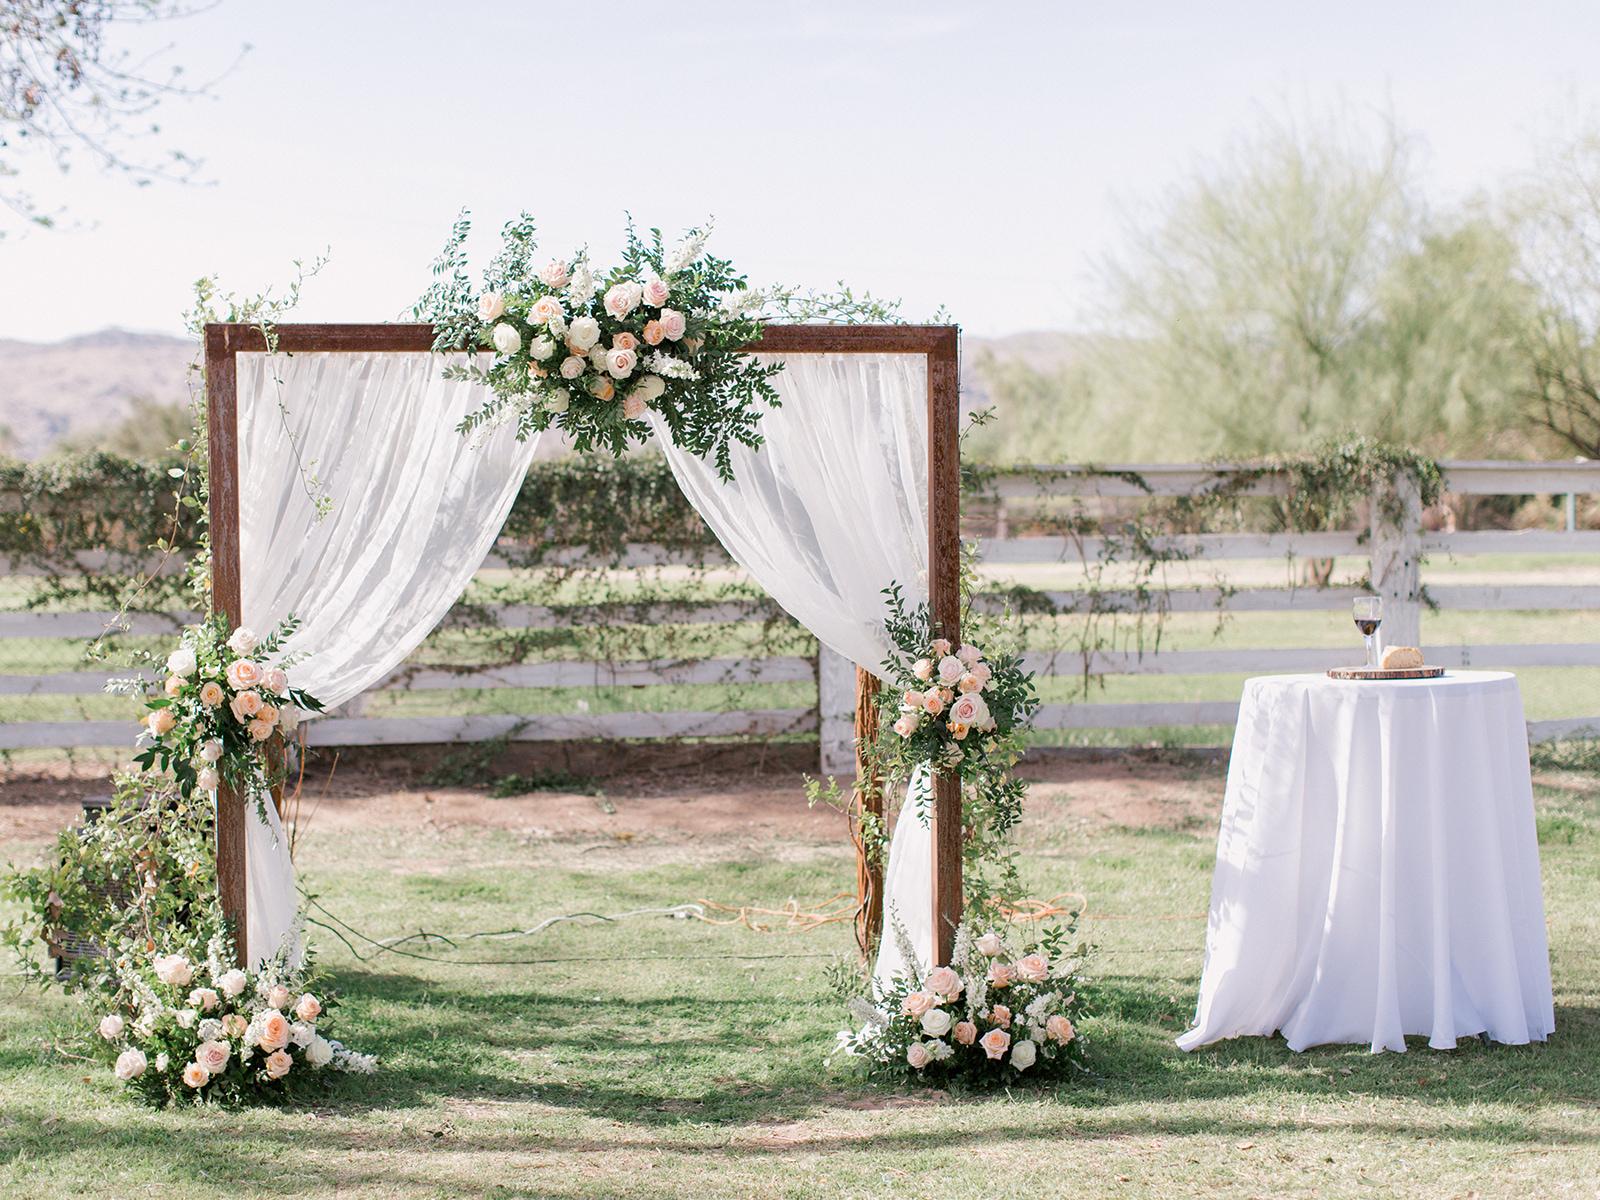 Lukas Wedding - Ceremony-12.jpg